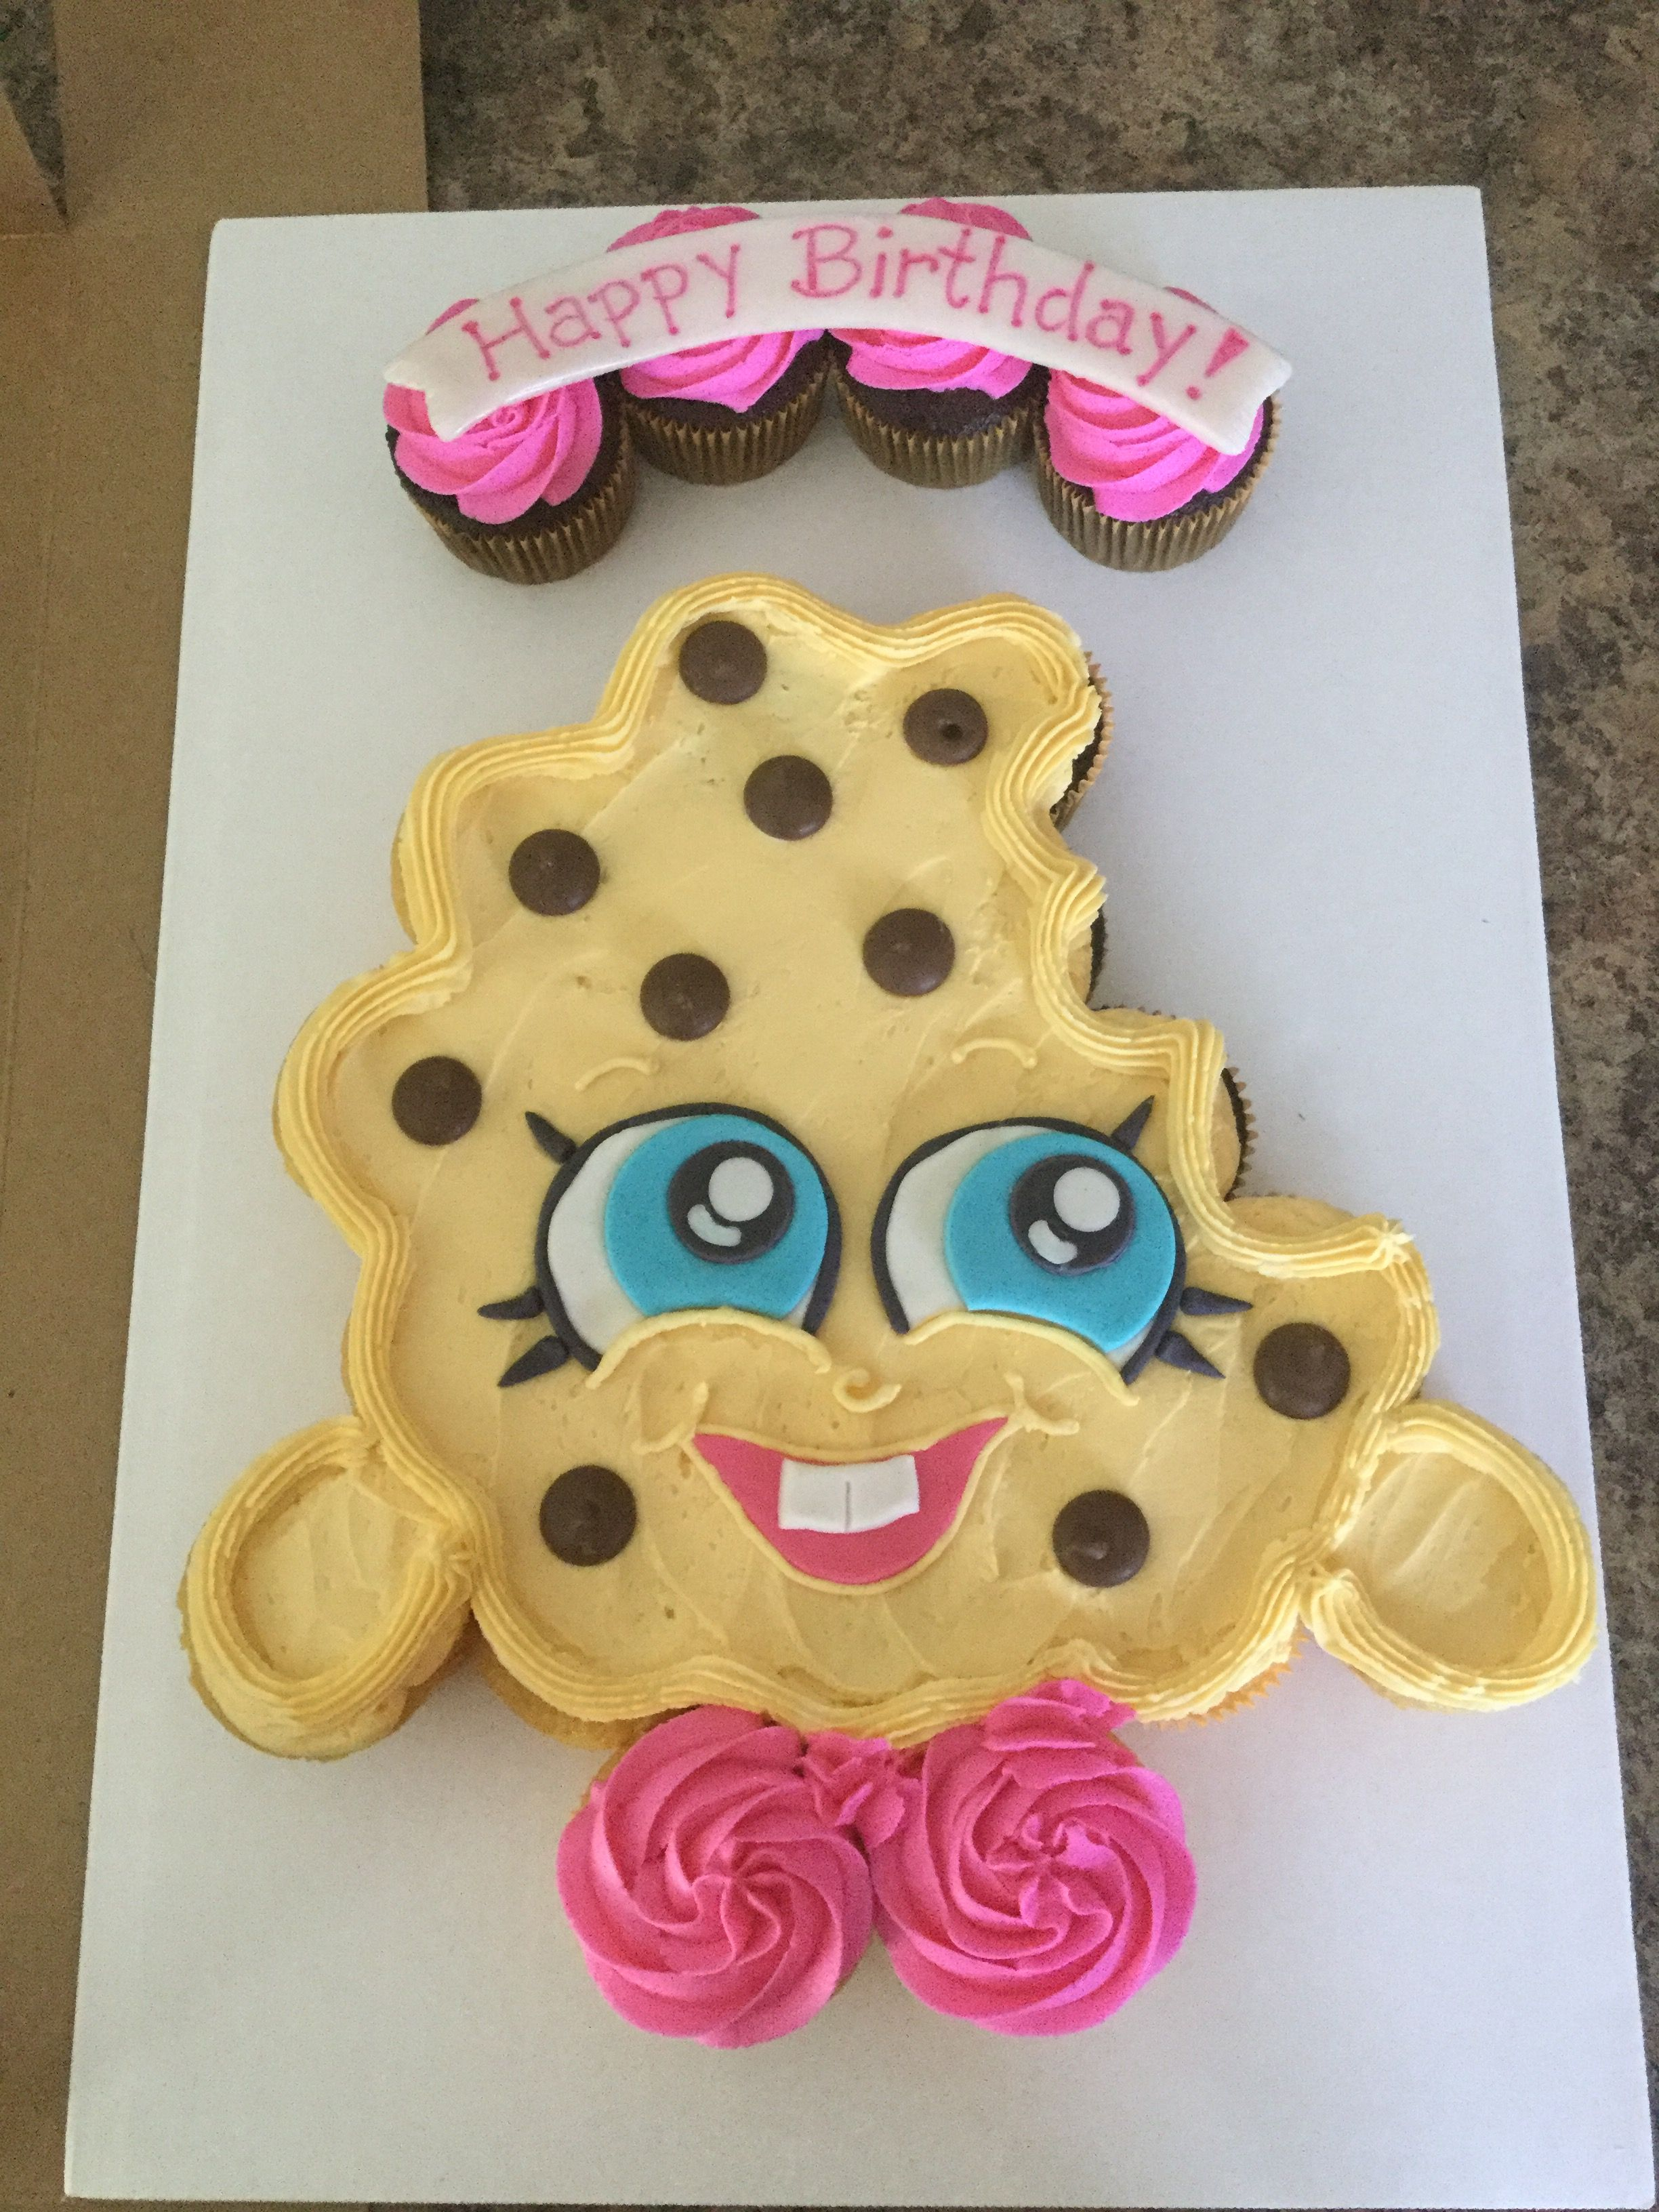 Kookie Cookie Cupcake Cake Shopkins Shopkins Birthday Cake Shopkins Cake Pull Apart Cupcake Cake